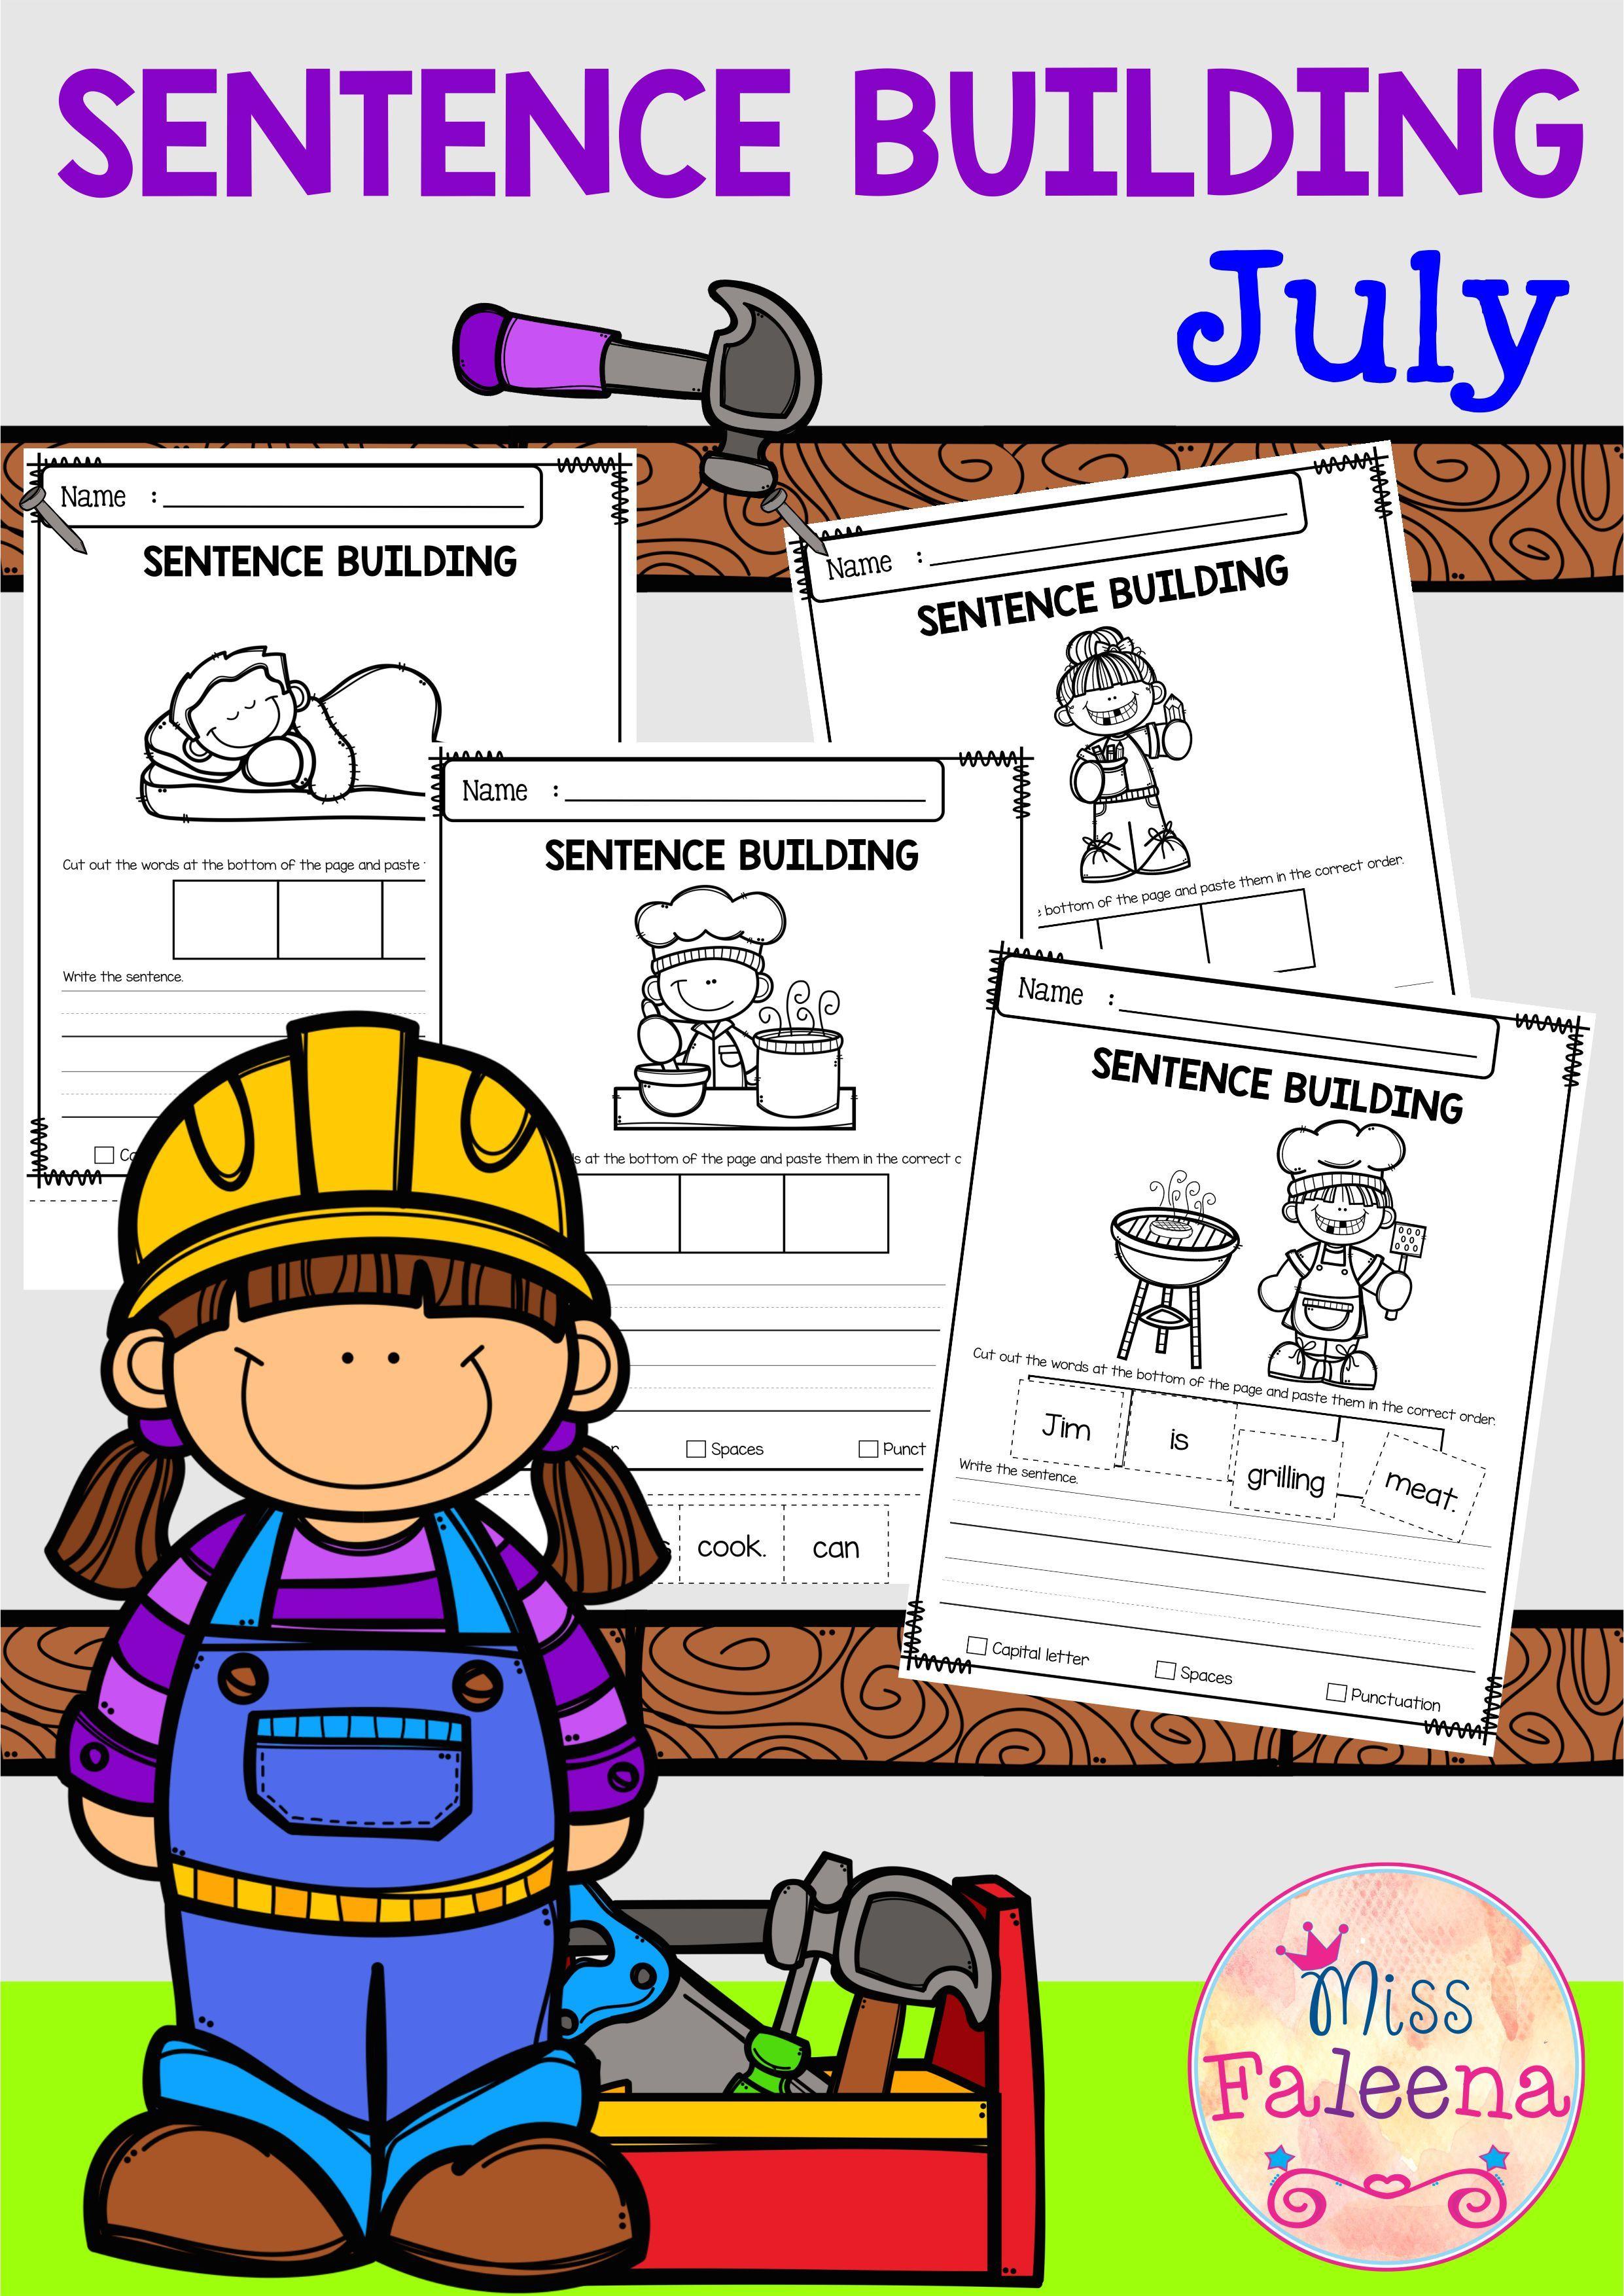 July Sentence Building